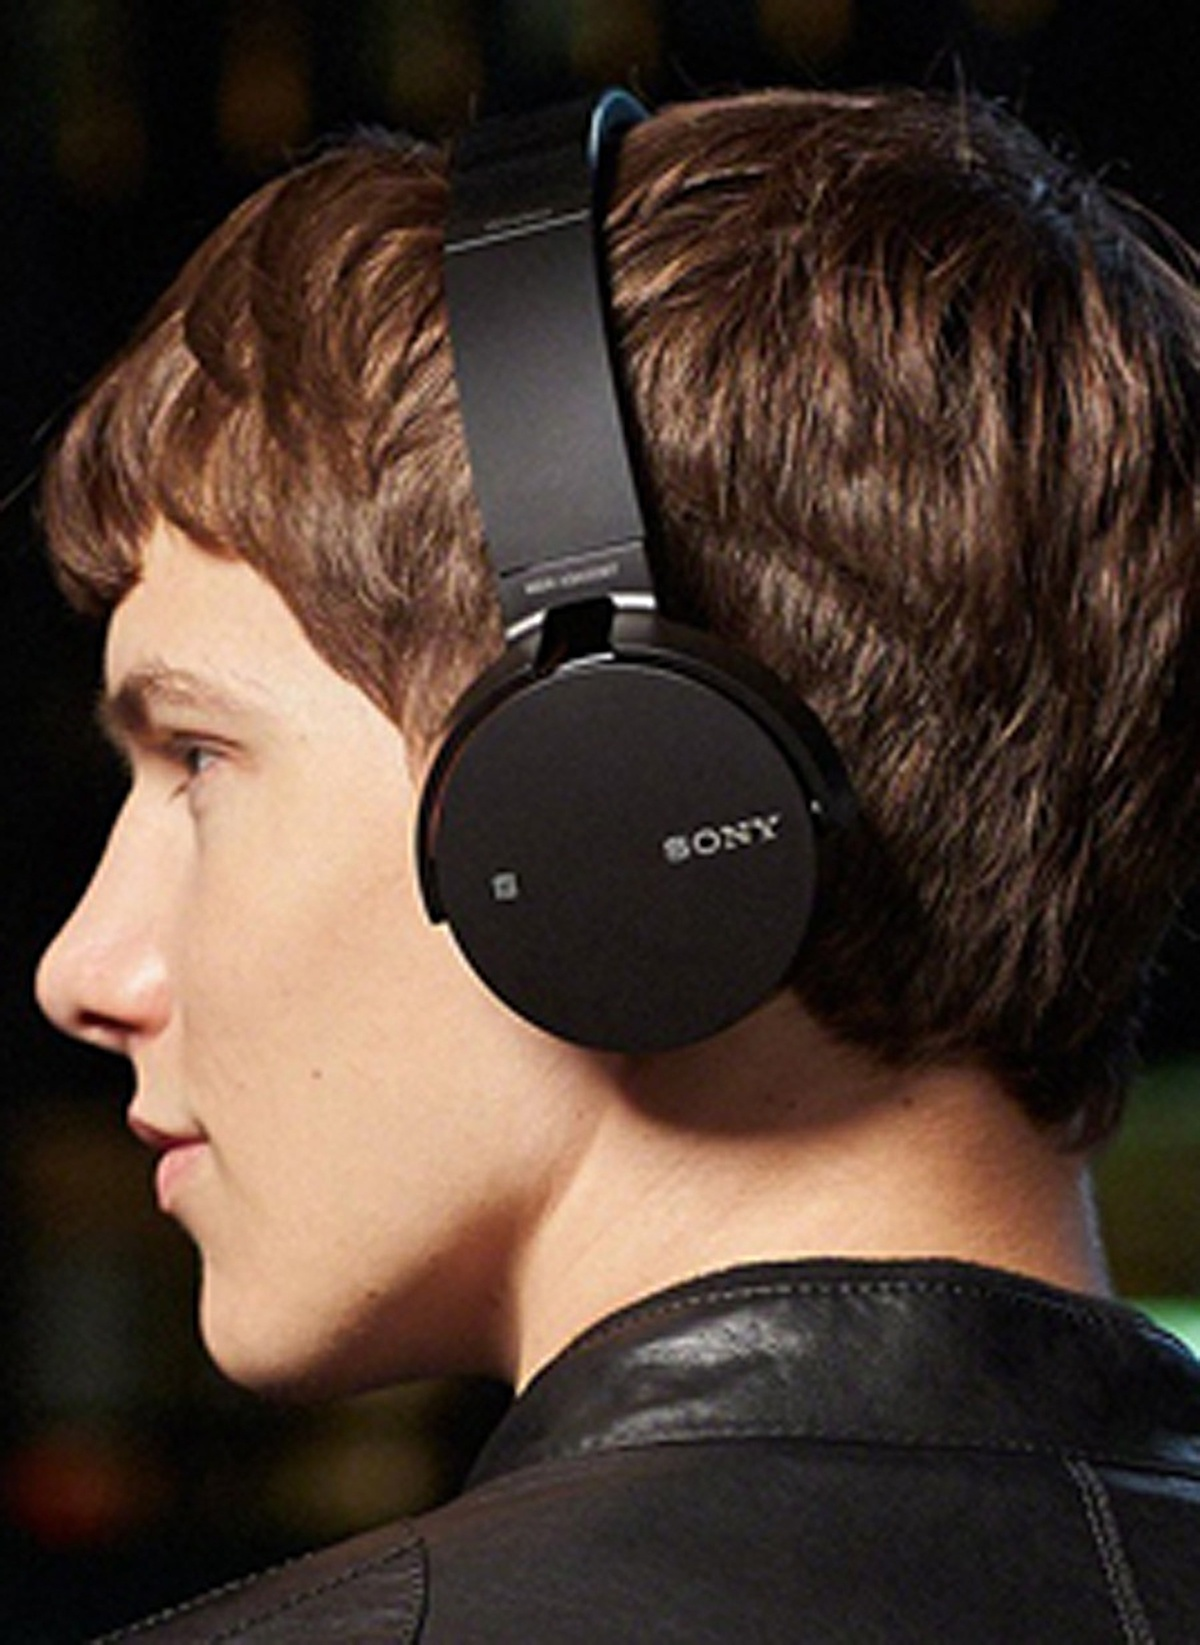 Sony Standart Mdr Xb 650 Btb Bluetooth Kulakst Kulaklk Siyah Xb650btb Black